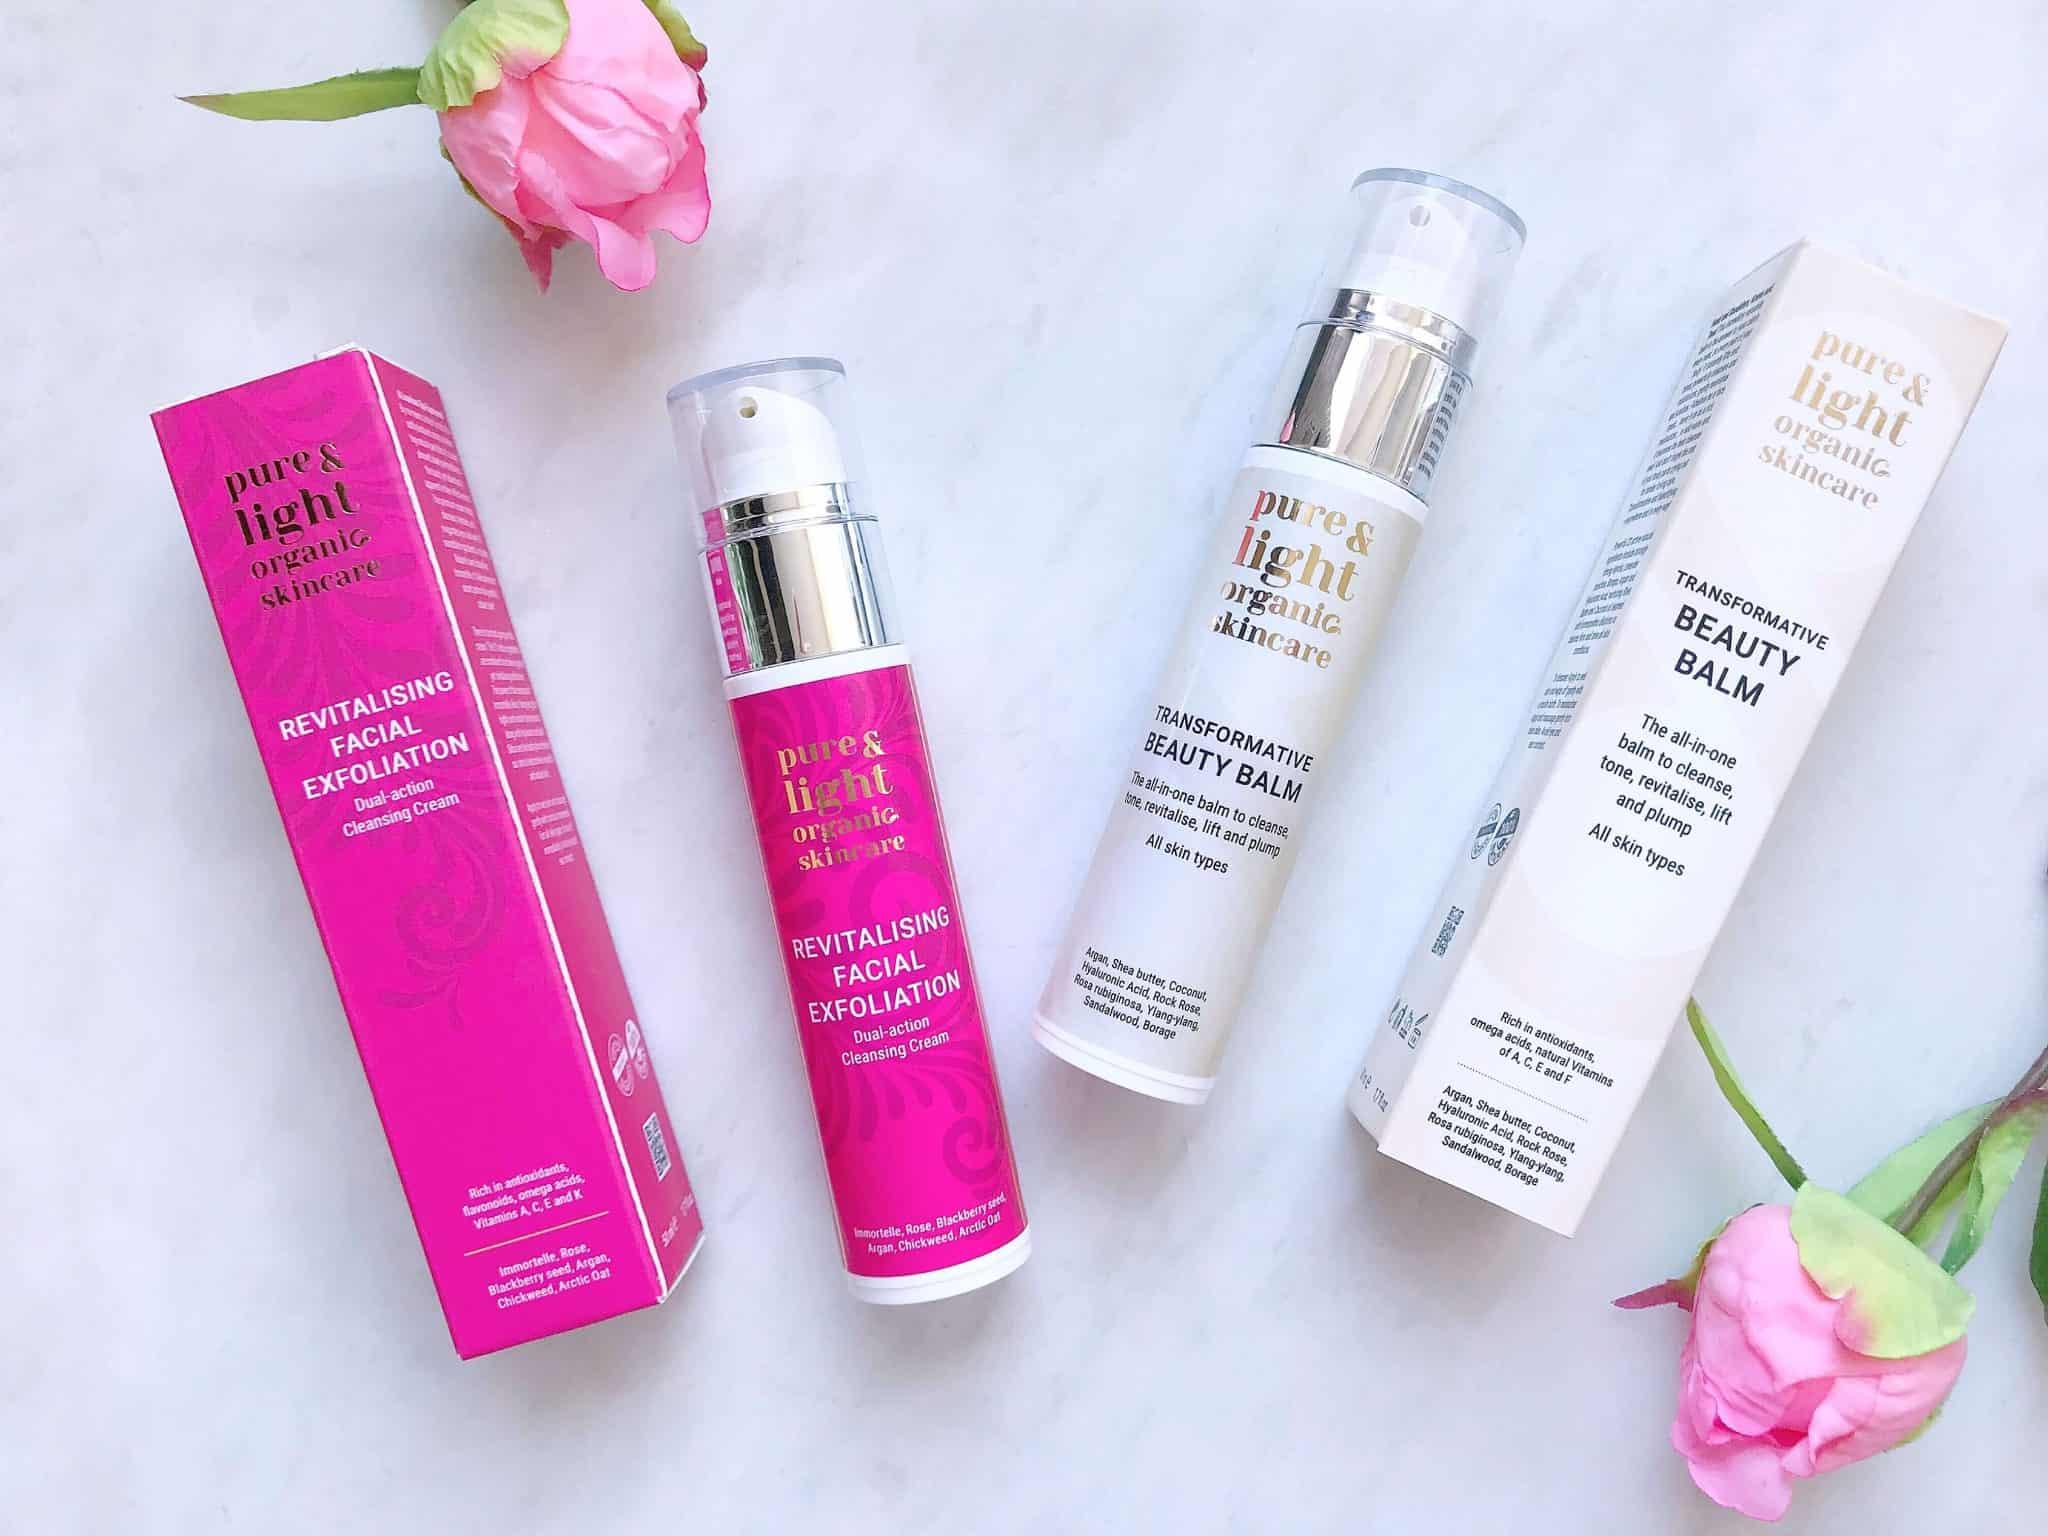 Pure & Light Organic Skincare Review